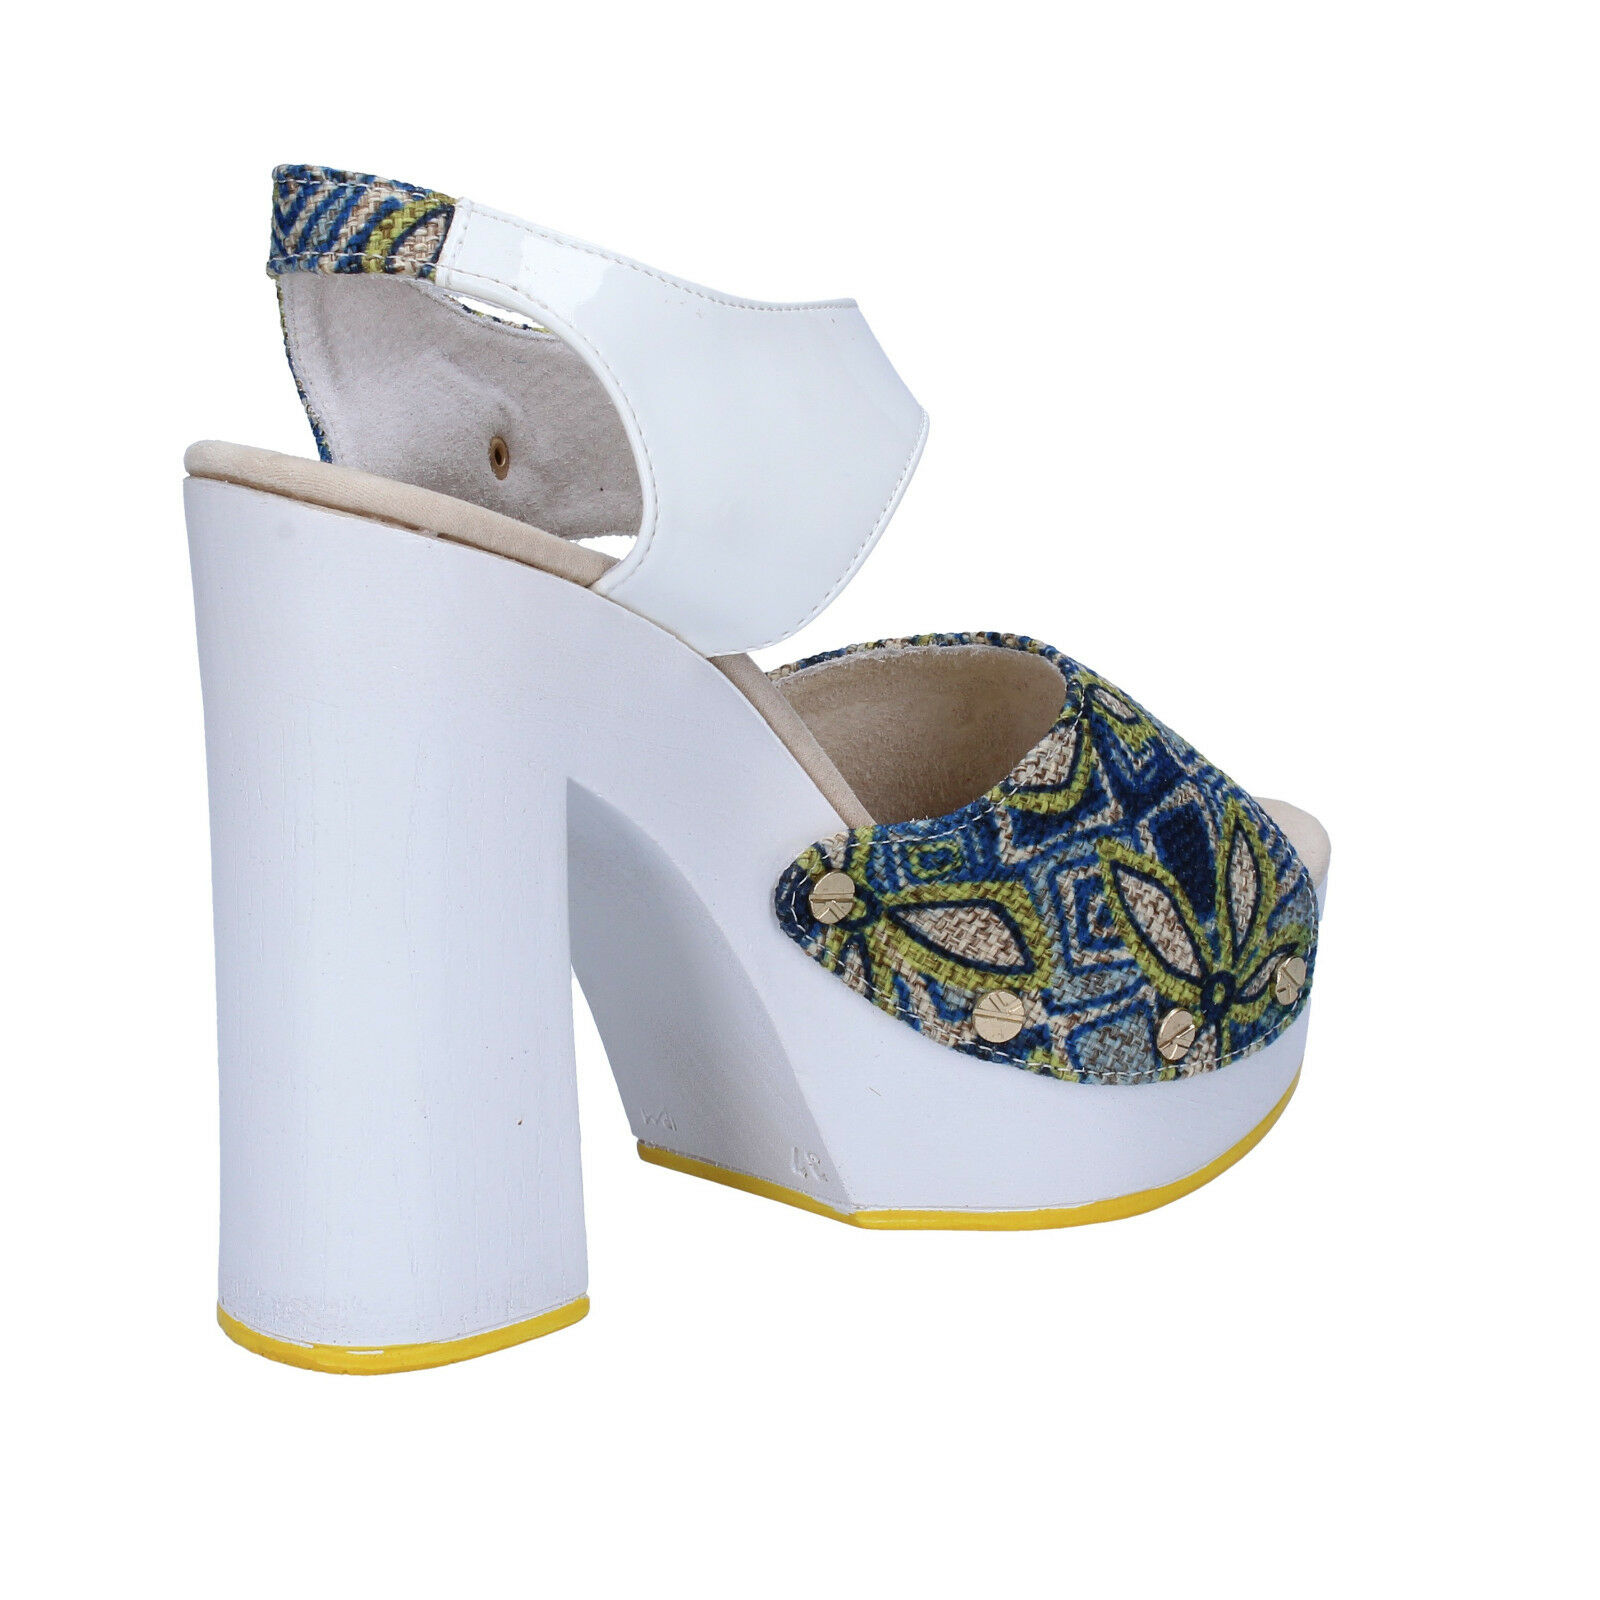 scarpe donna SUKY BRAND BRAND BRAND 37 sandali blu ( bianco ) tessuto vernice AC487-C 10c987